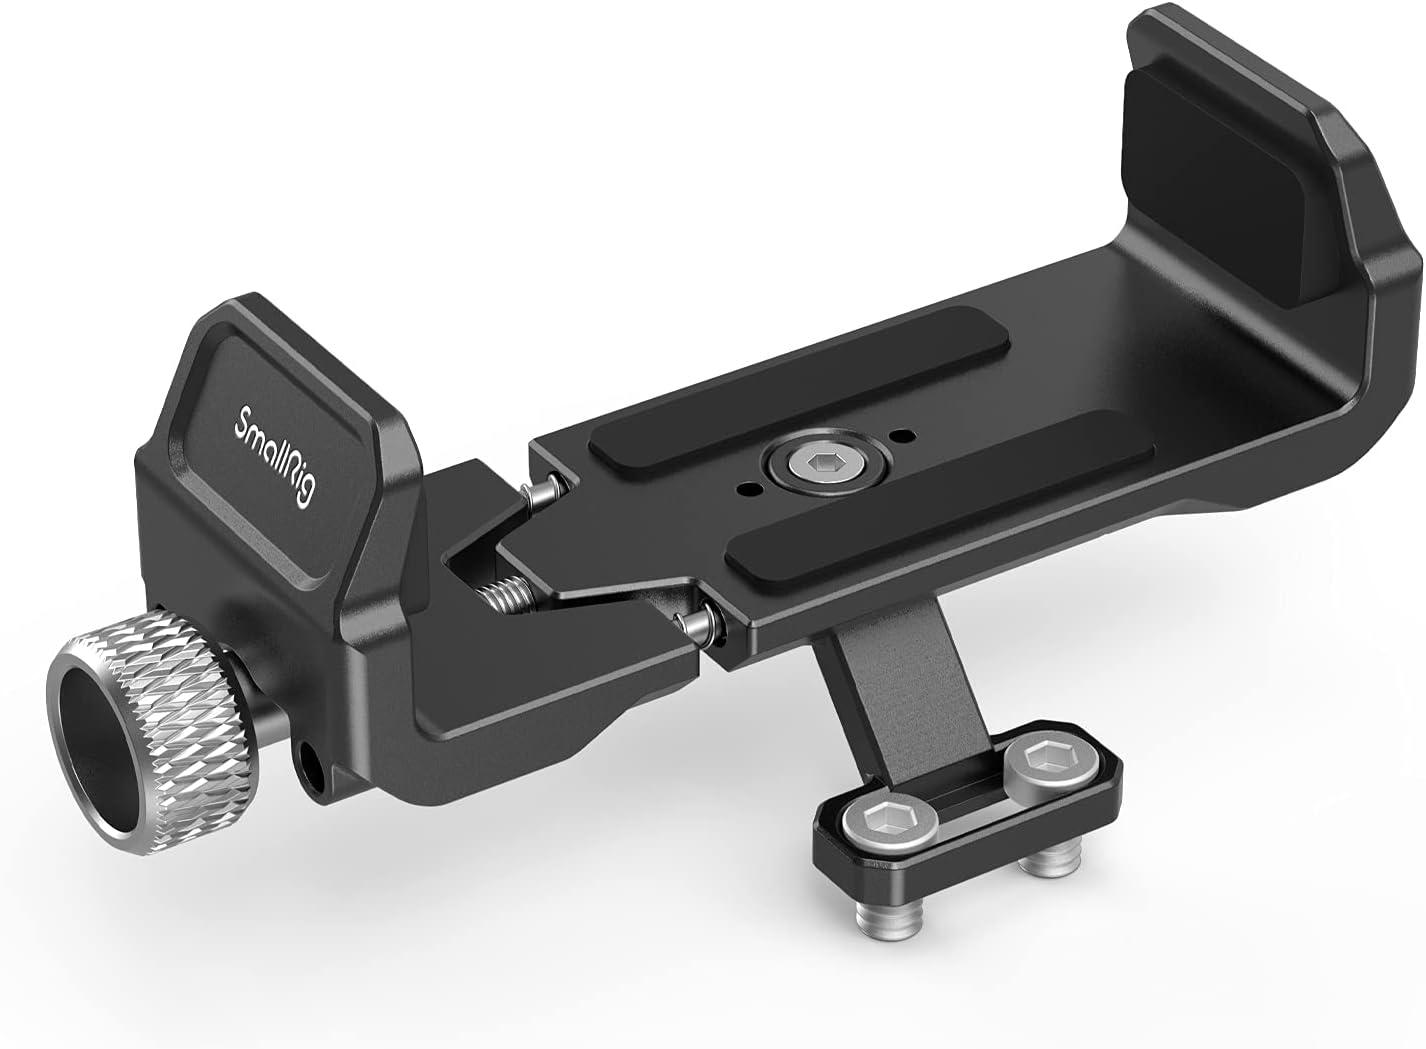 Spring new work SMALLRIG Converter Holder for AJA Blackmagic HA5-12G Design Reservation HD